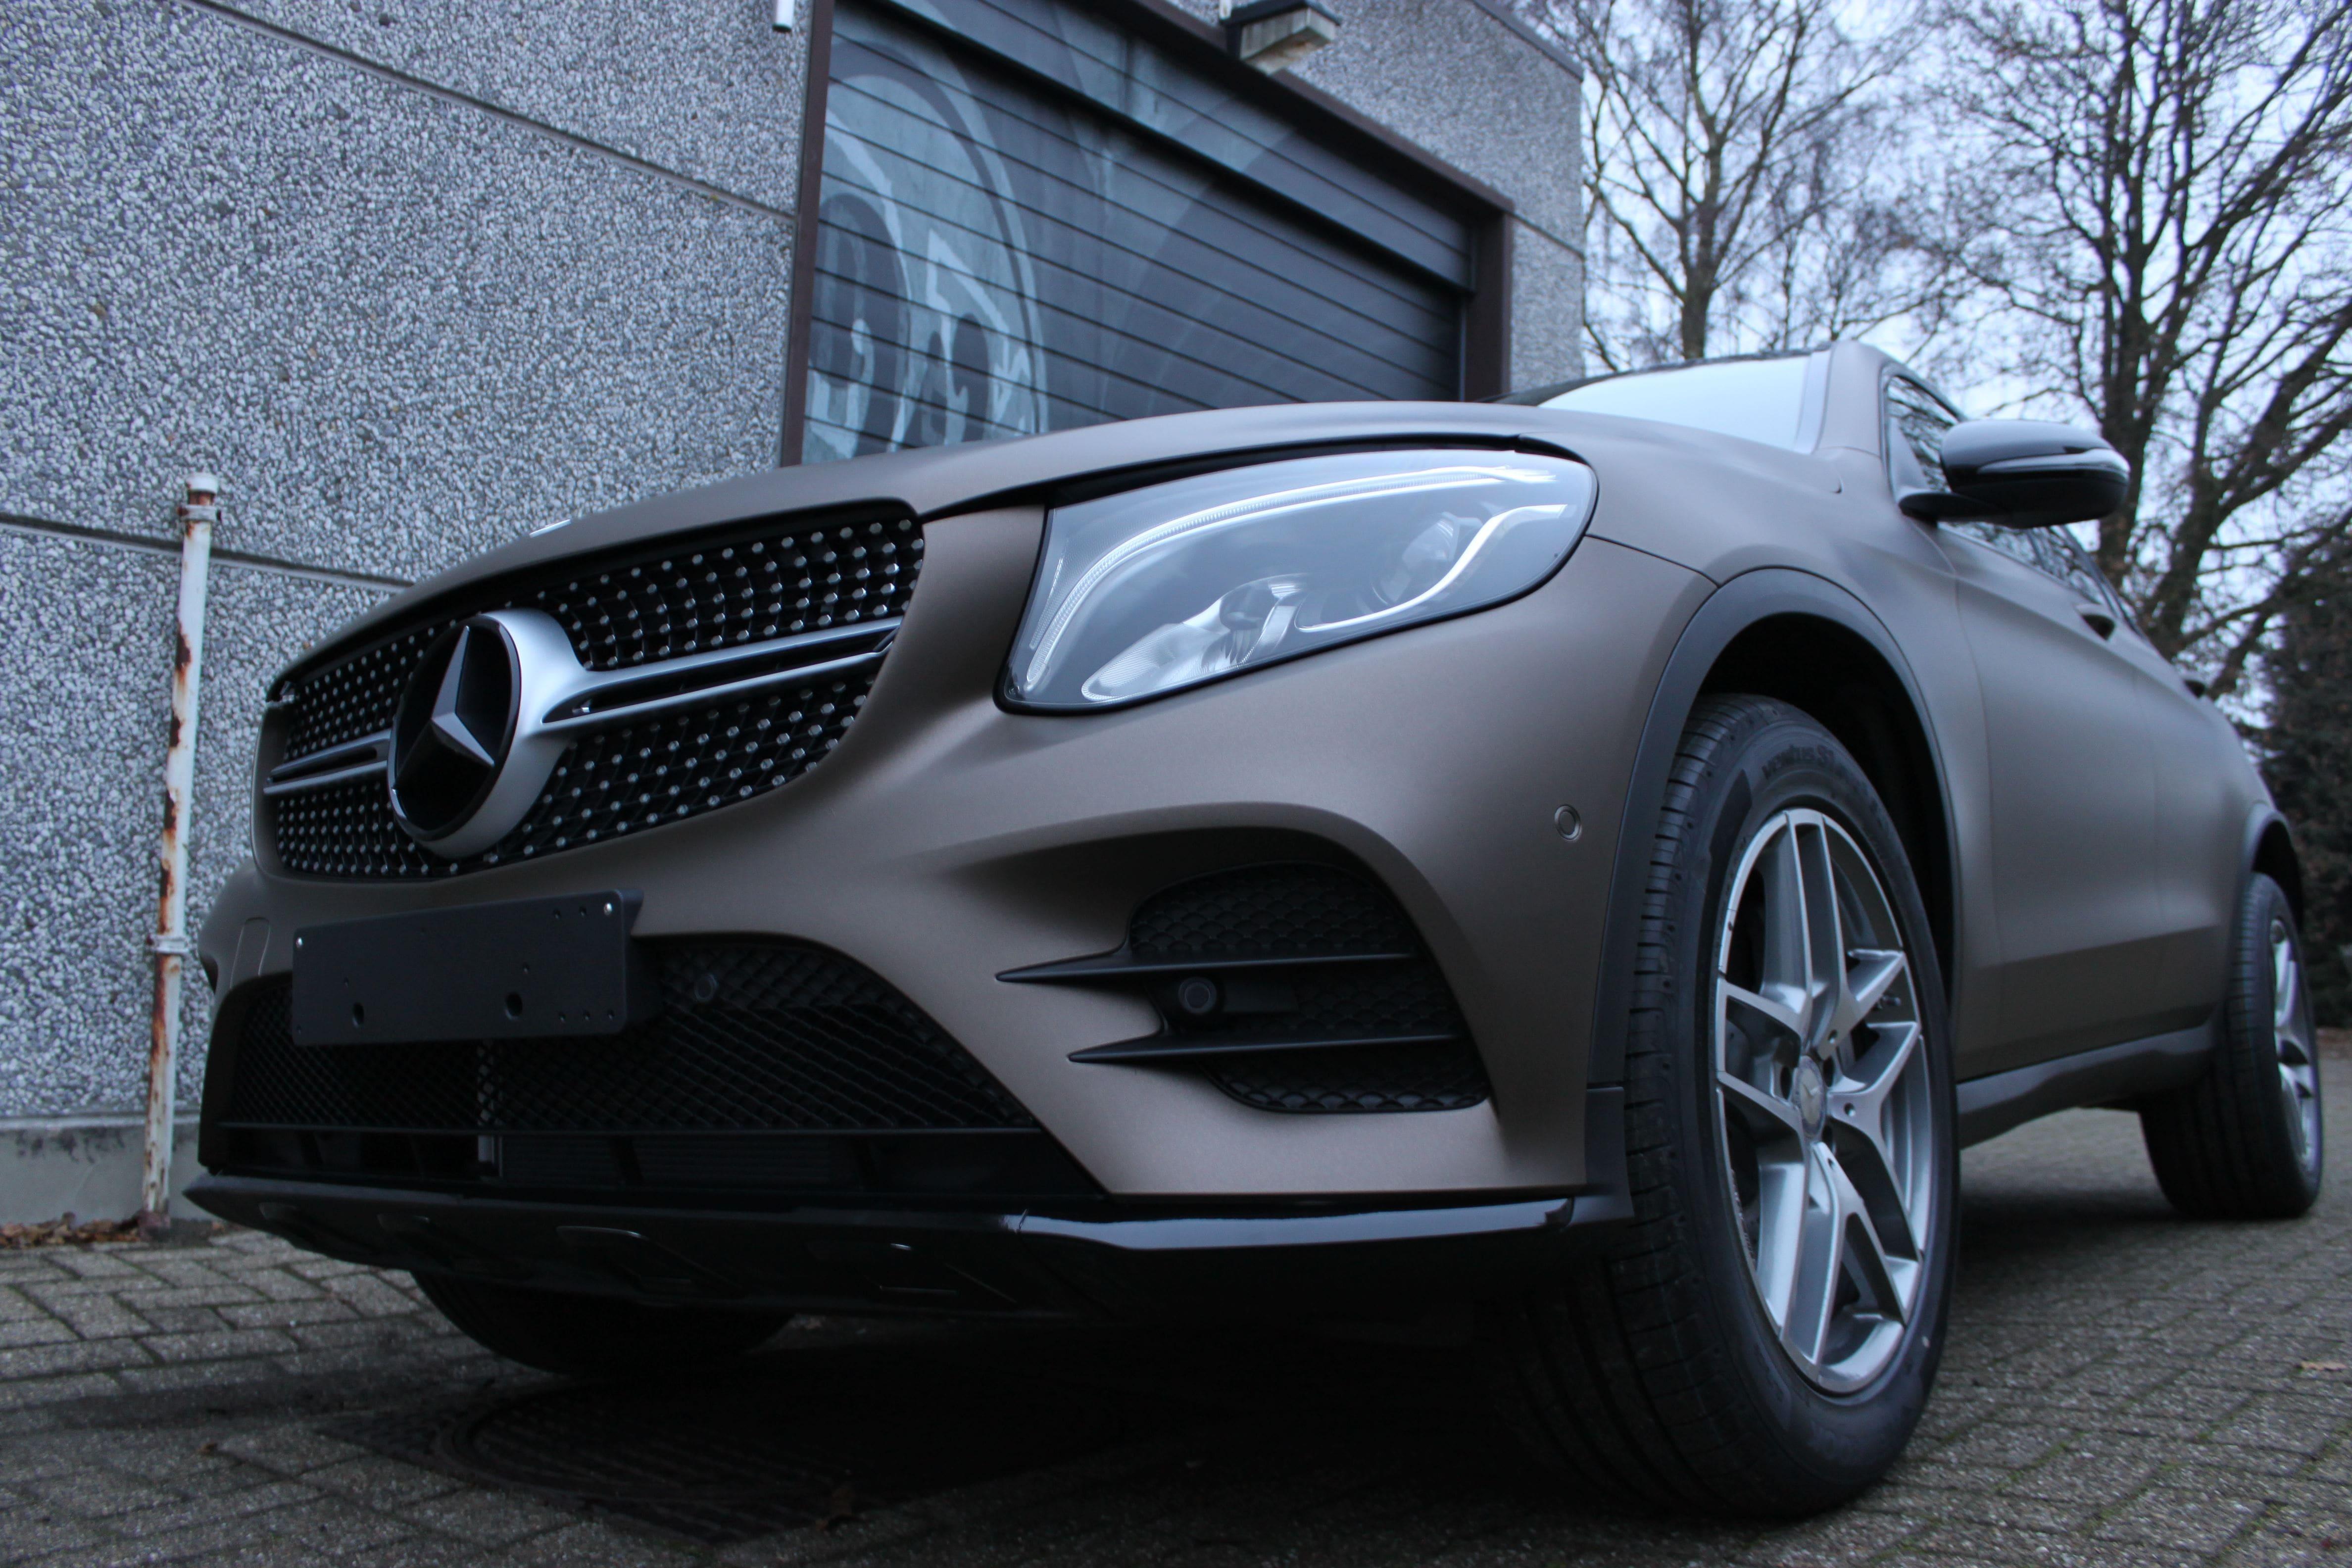 Mercedes GLC Coupe Matte metallic brown, Carwrapping door Wrapmyride.nu Foto-nr:9359, ©2021